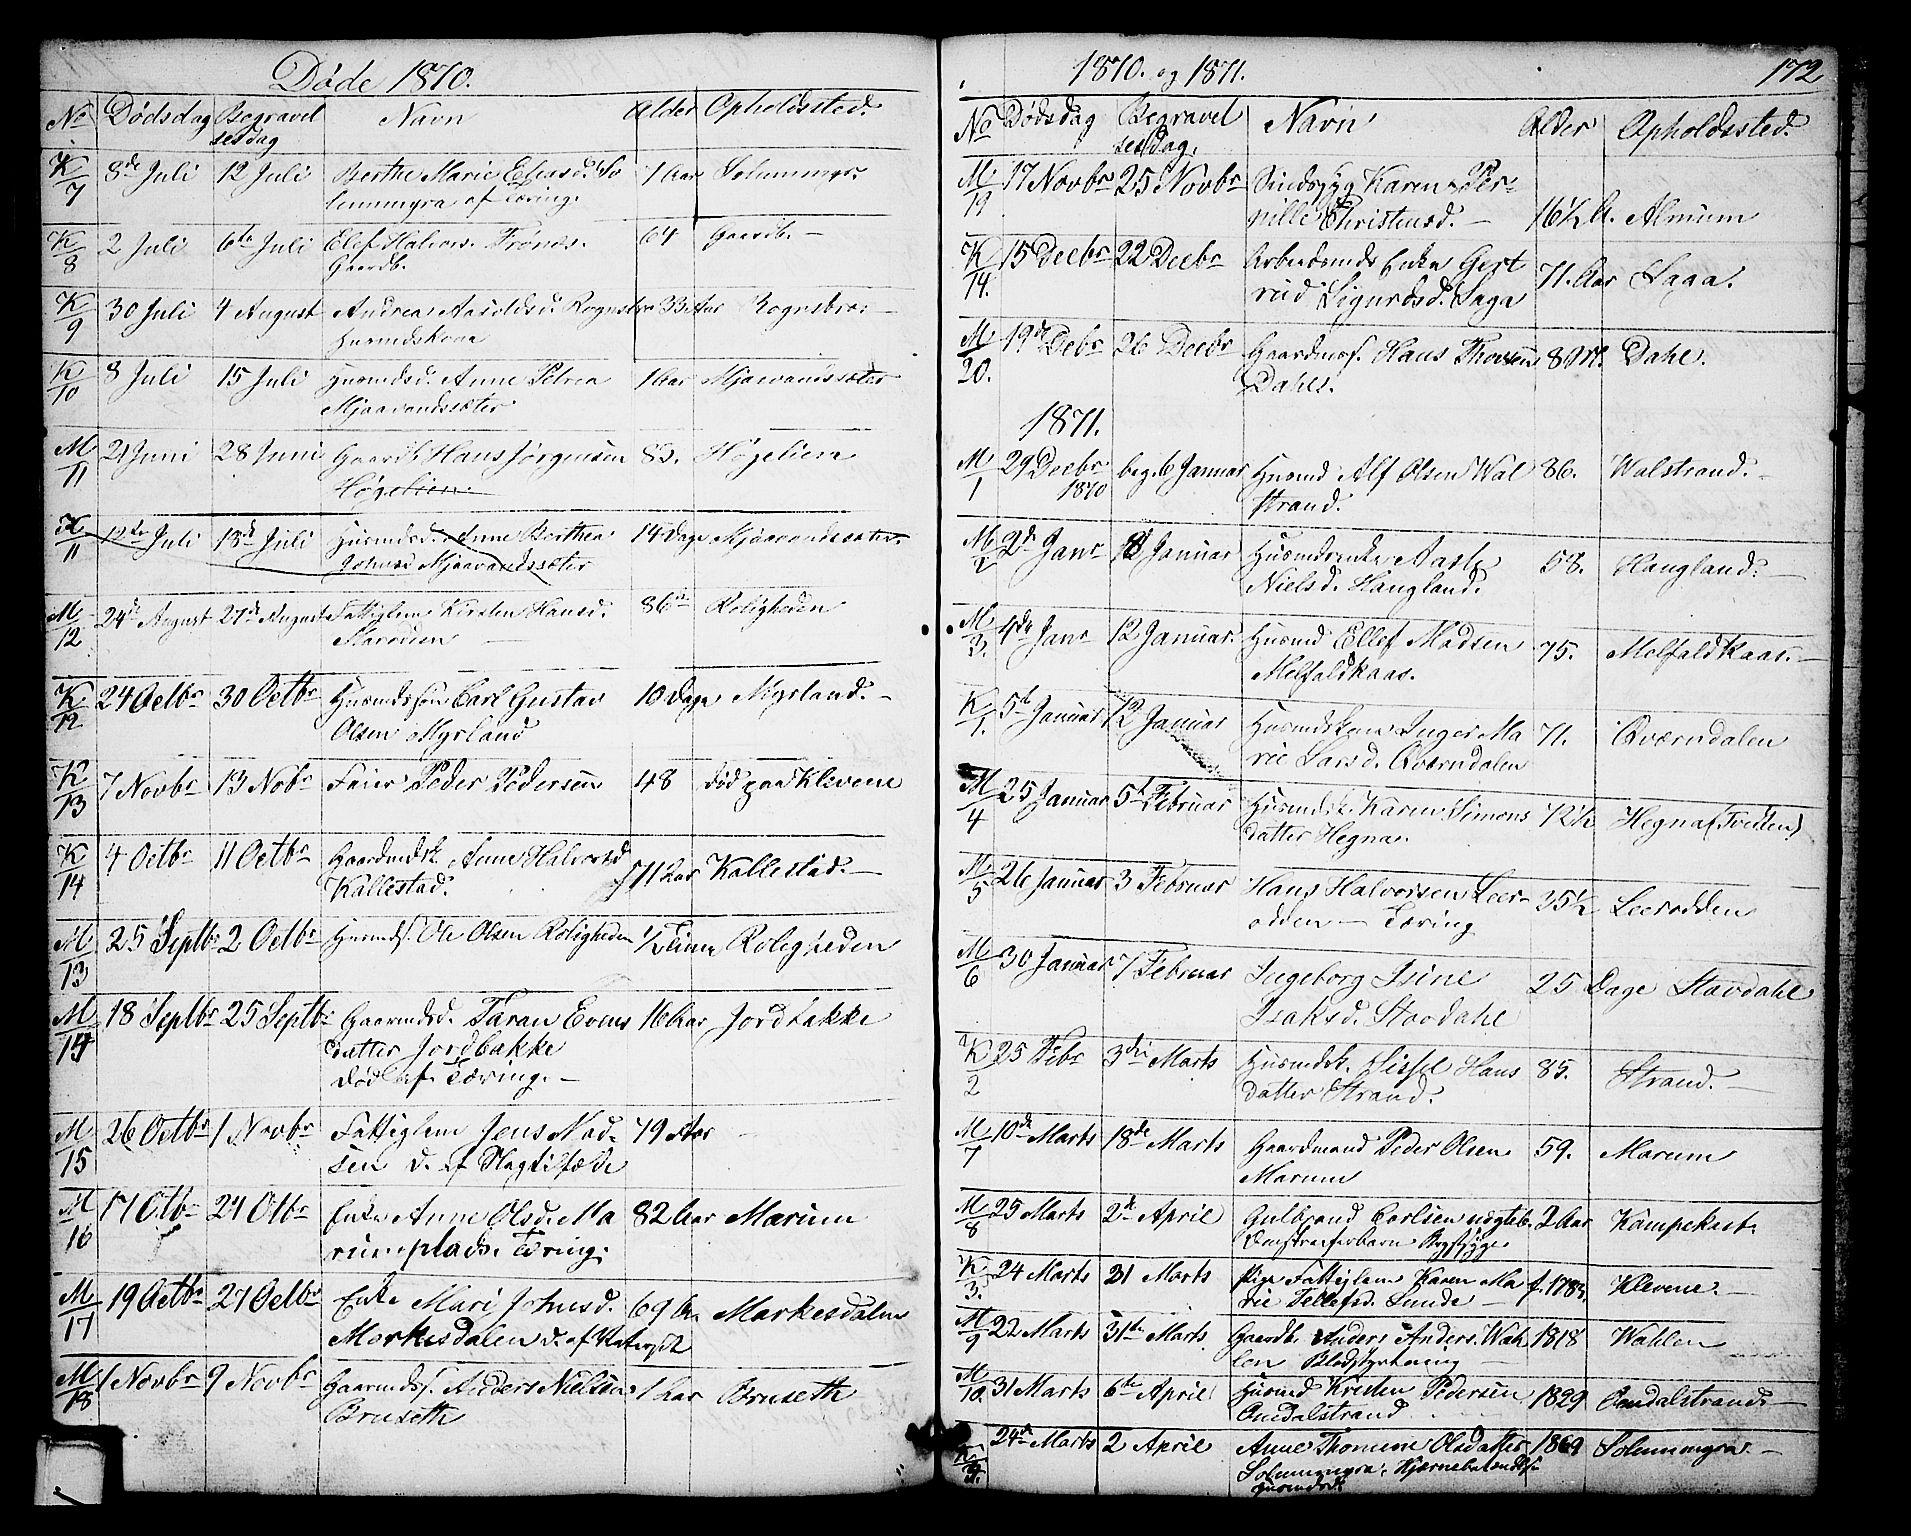 SAKO, Solum kirkebøker, G/Gb/L0002: Klokkerbok nr. II 2, 1859-1879, s. 172